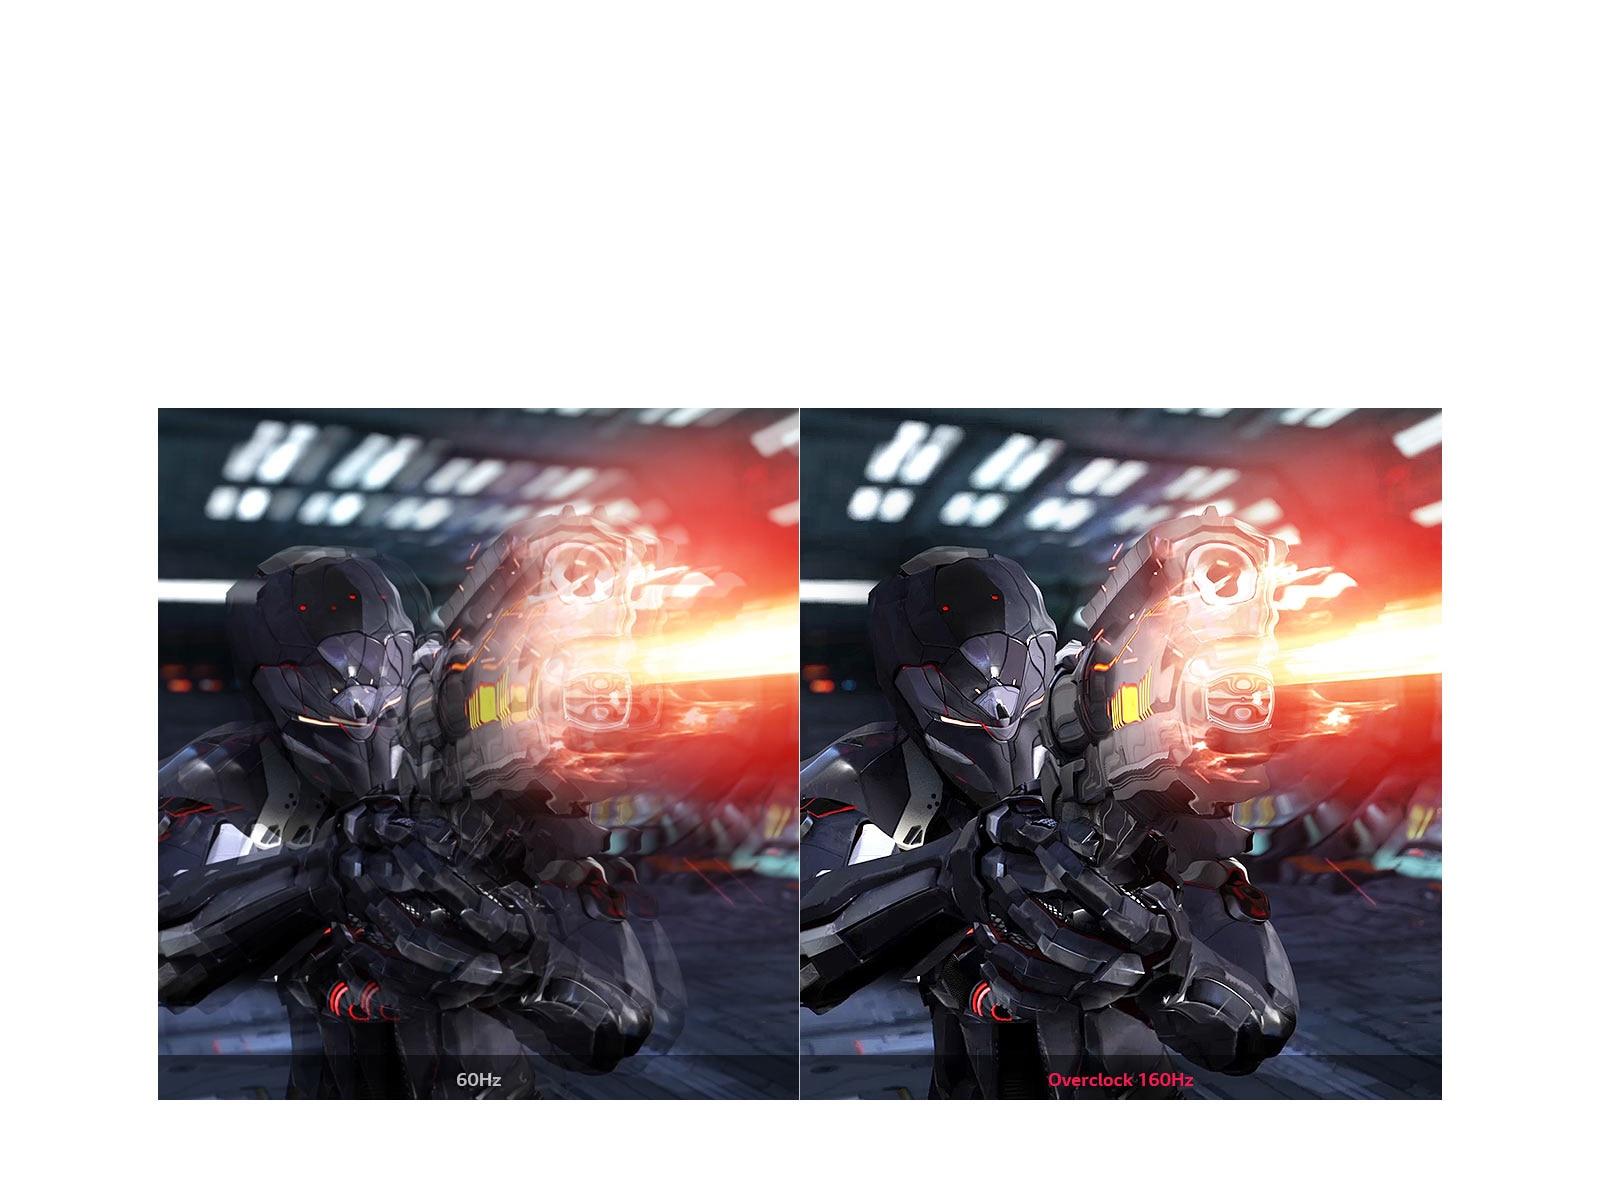 primerjava Fluid Gaming Motion s 60Hz in overclocking 160Hz